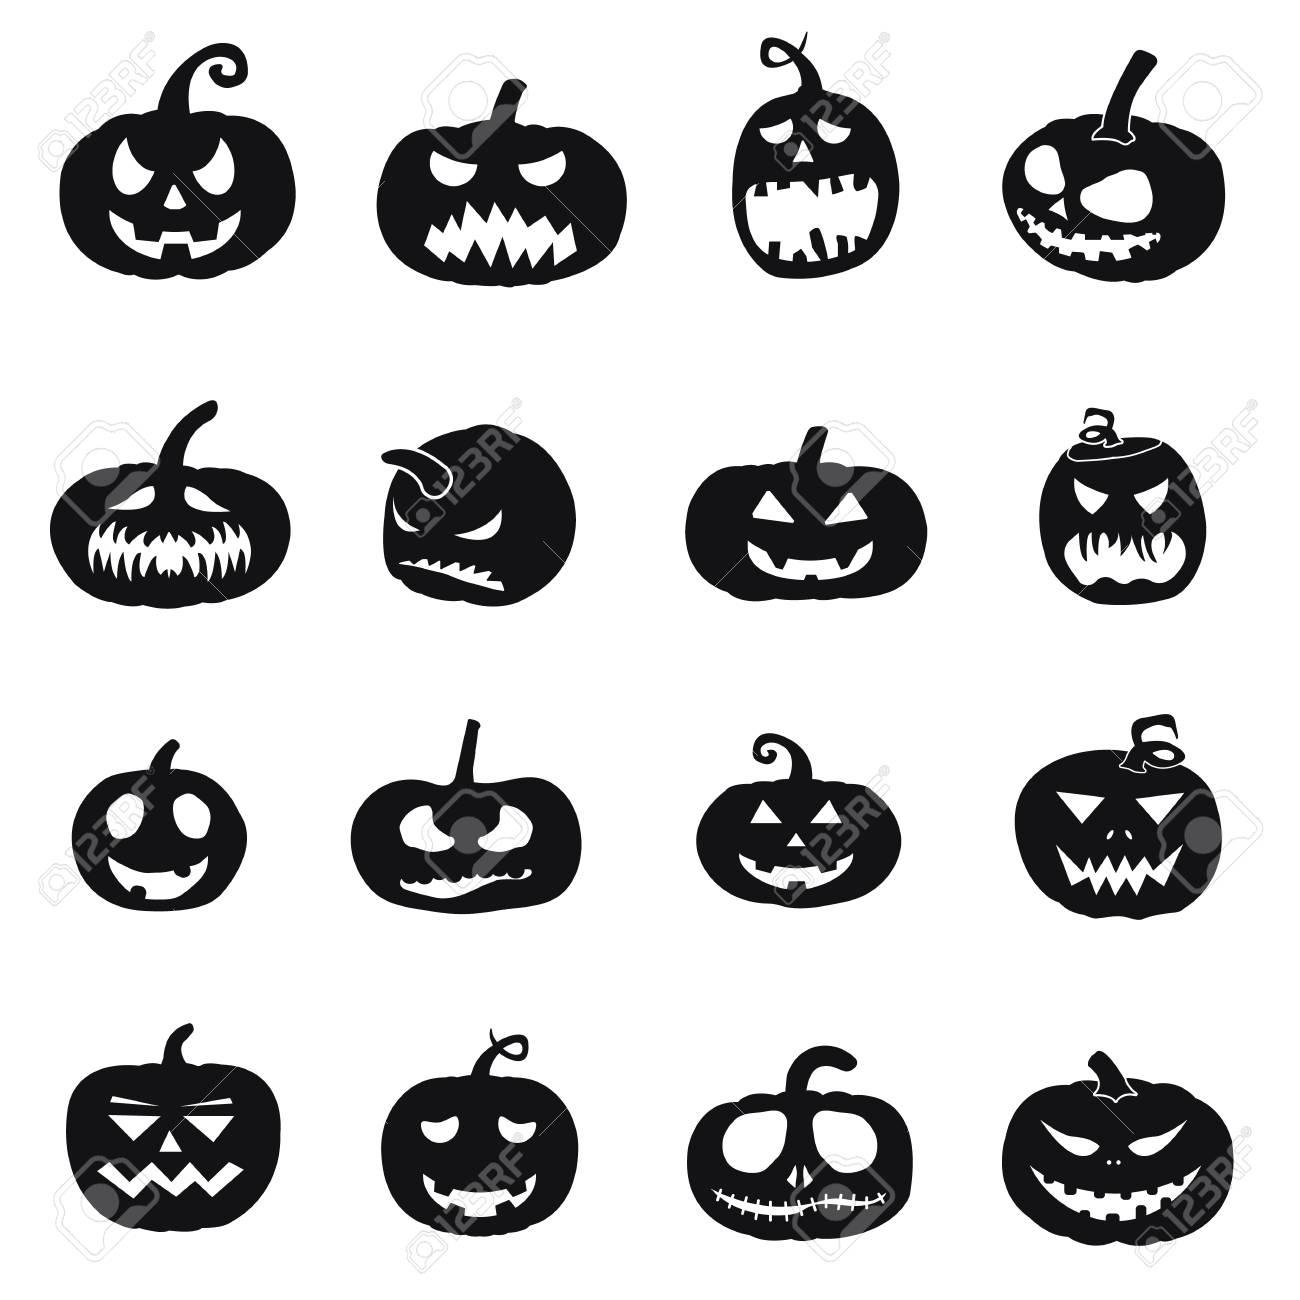 halloween pumpkins, pumpkin icons, halloween icons, halloween..